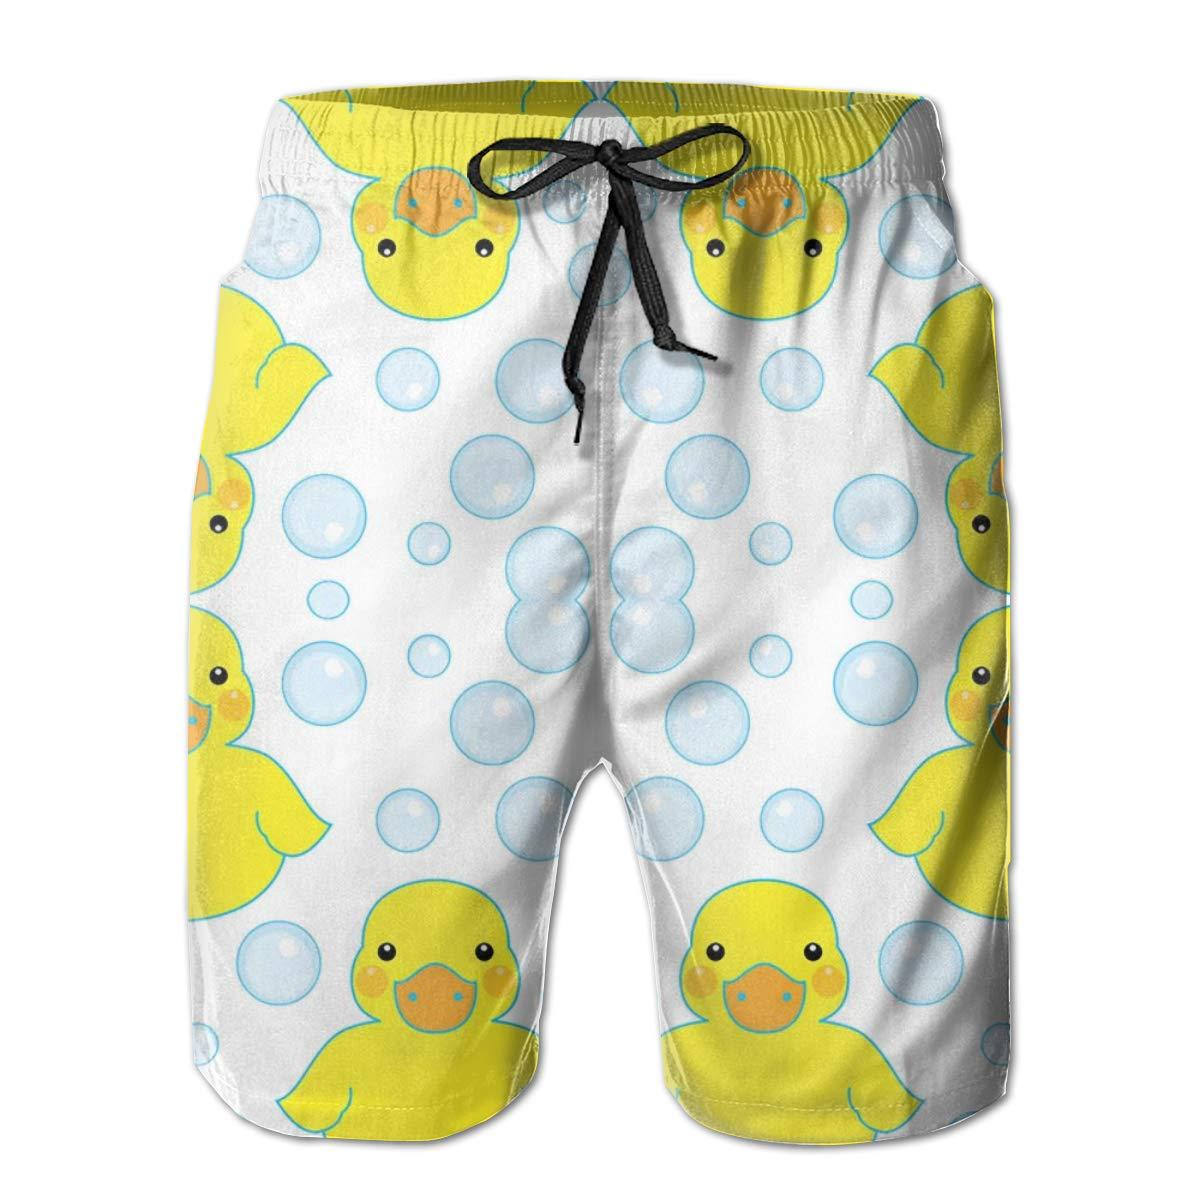 P-AKAS Men's 3D Print Board Shorts - Rubber Ducks and Bubbles Casual Fashion Swim Trunks - Side Pockets Elastic Waist Drawstring Water Beach Sports Running Swimwear